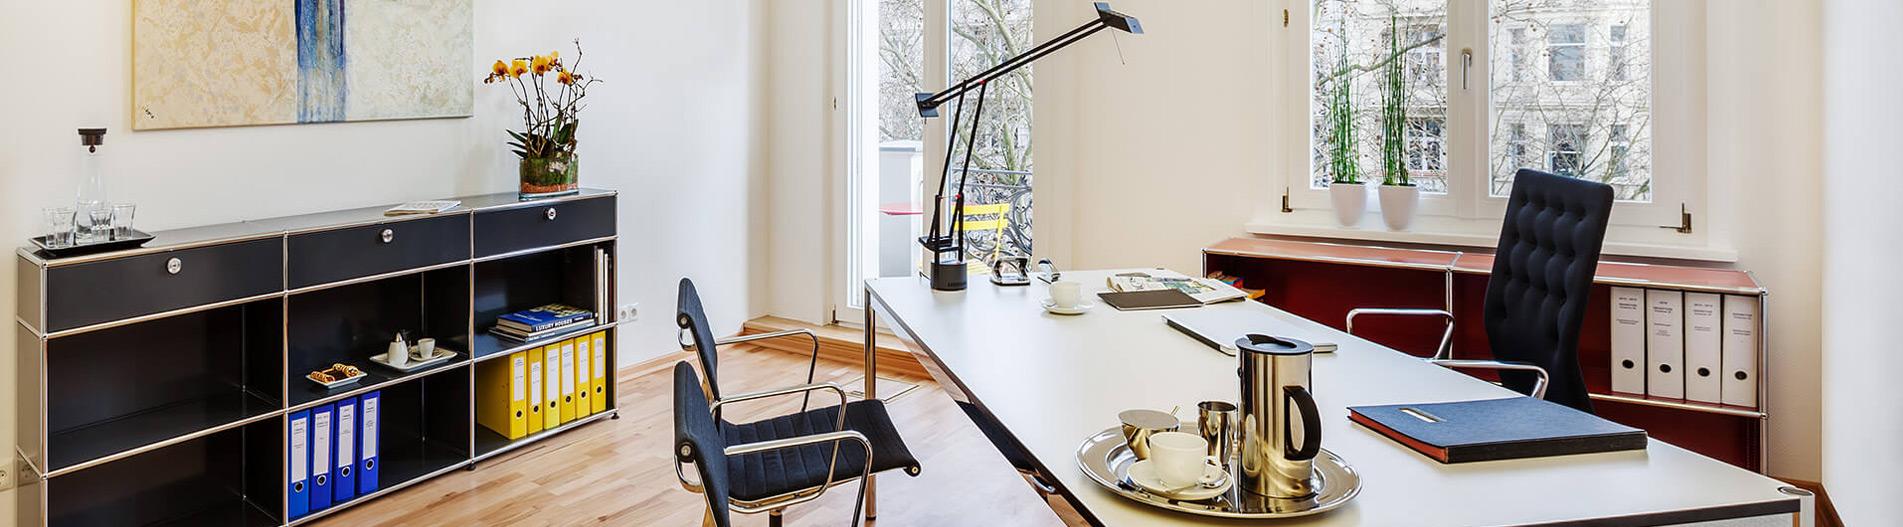 Büros am Kurfürstendamm in Berlin